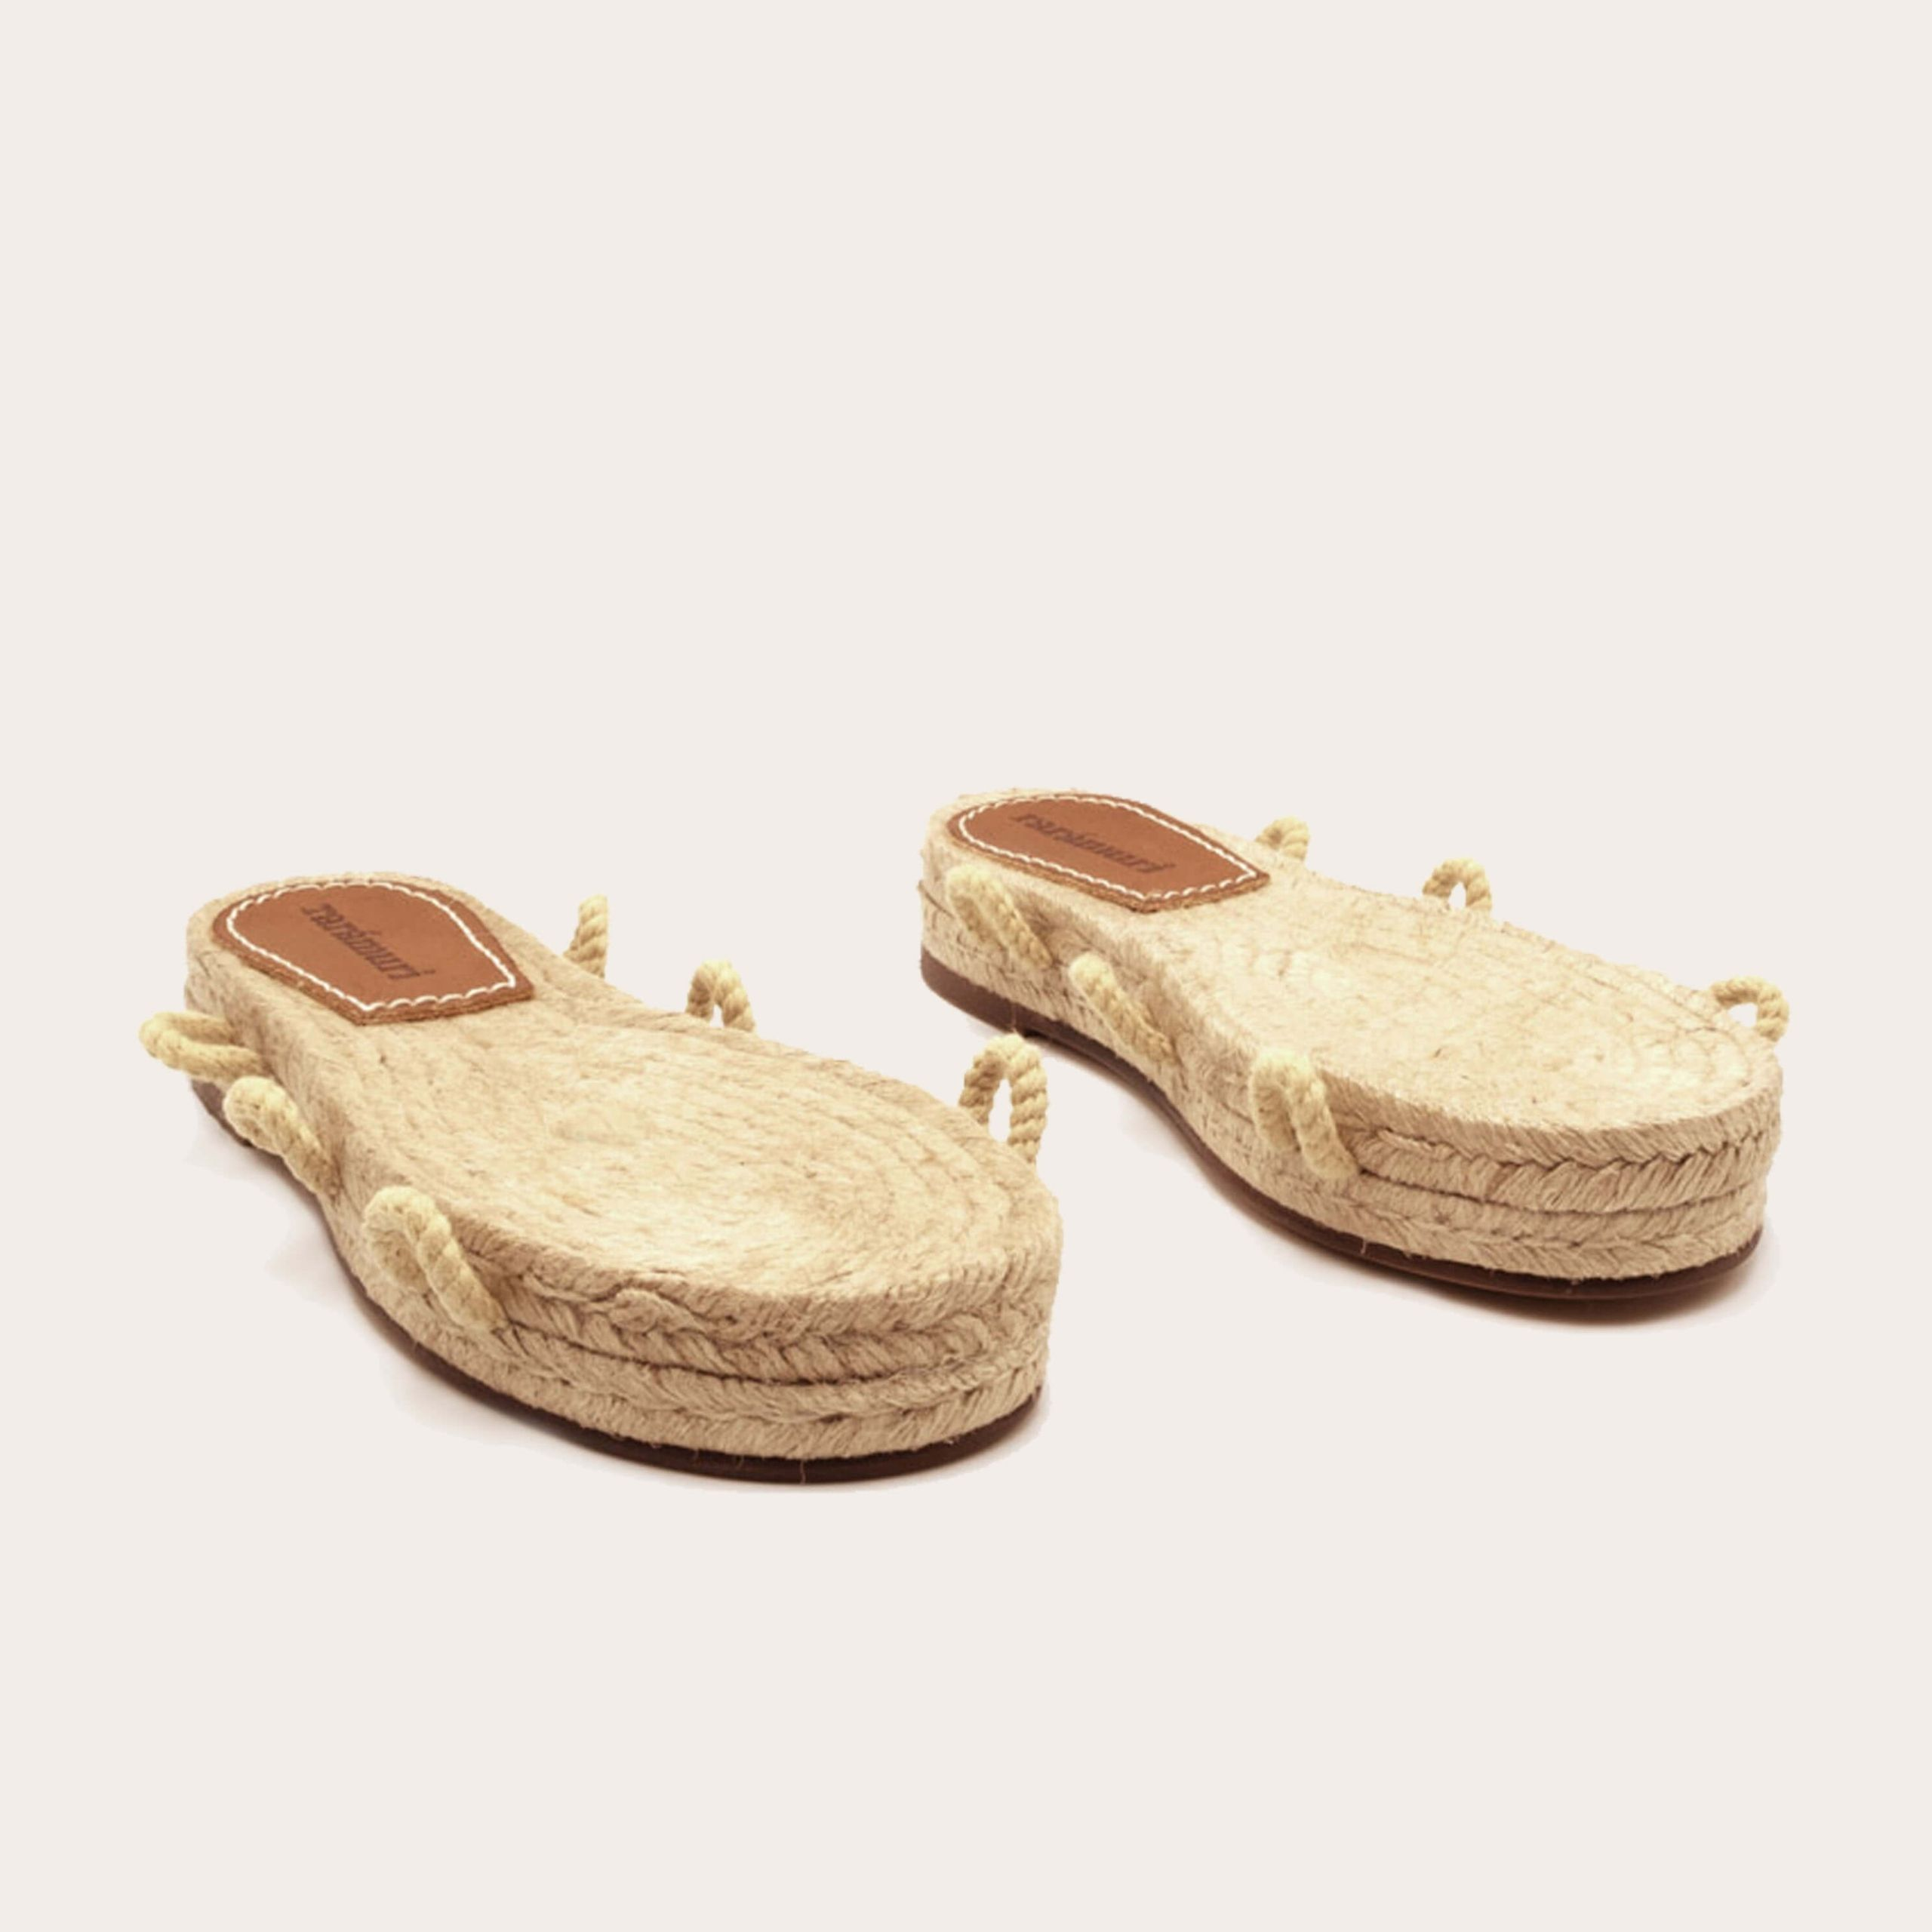 cruz-high_2_lintsandalen sandals travelsandals vegan sustainable sandals wikkelsandalen